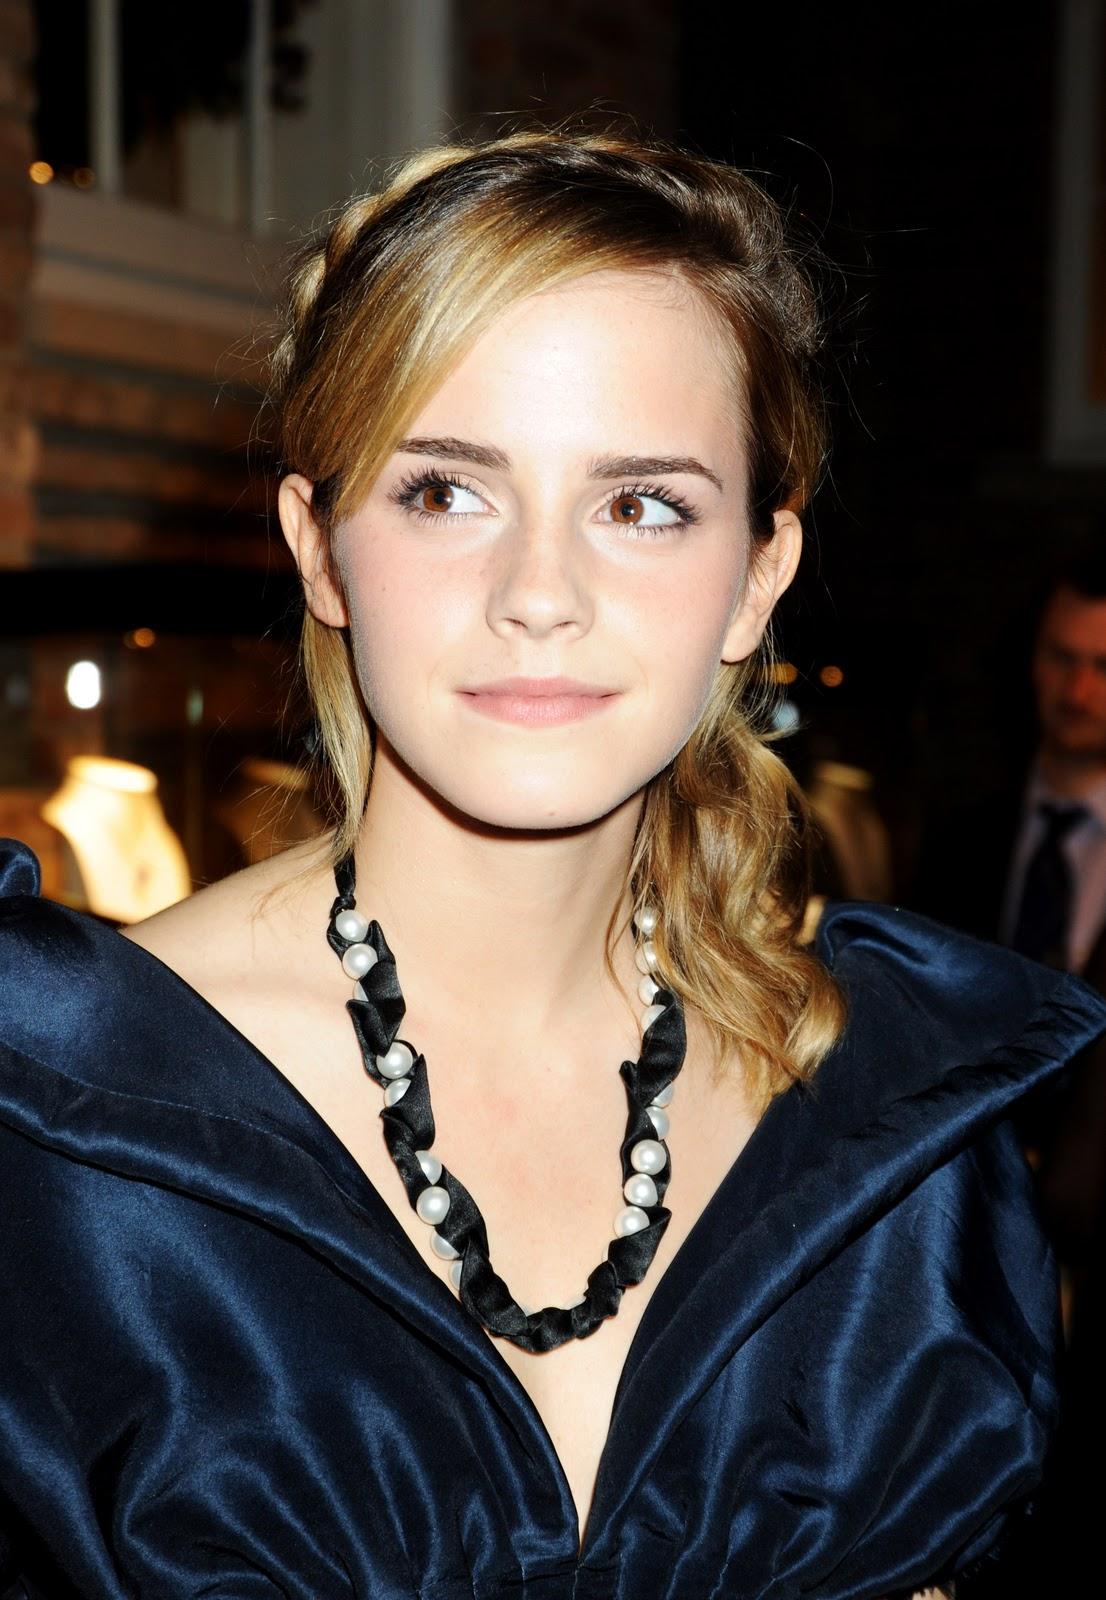 http://3.bp.blogspot.com/-mFdAv9nZQOg/Tt_SZycRxFI/AAAAAAAADM8/uxr3S6PYNCc/s1600/Girl+Hairstyle%252C+Photo+Gallery%252C+Emma+Watson+Hairstyles%252C+Celebrity+Emma+Watson+Hairstyles%252C+Emma+Watson+Hairstyles+Photo%252C+Latest+Emma+Watson+Hairstyles%252C+Emma+Watson+Hairstyles+Cutting+%252820%2529.jpg